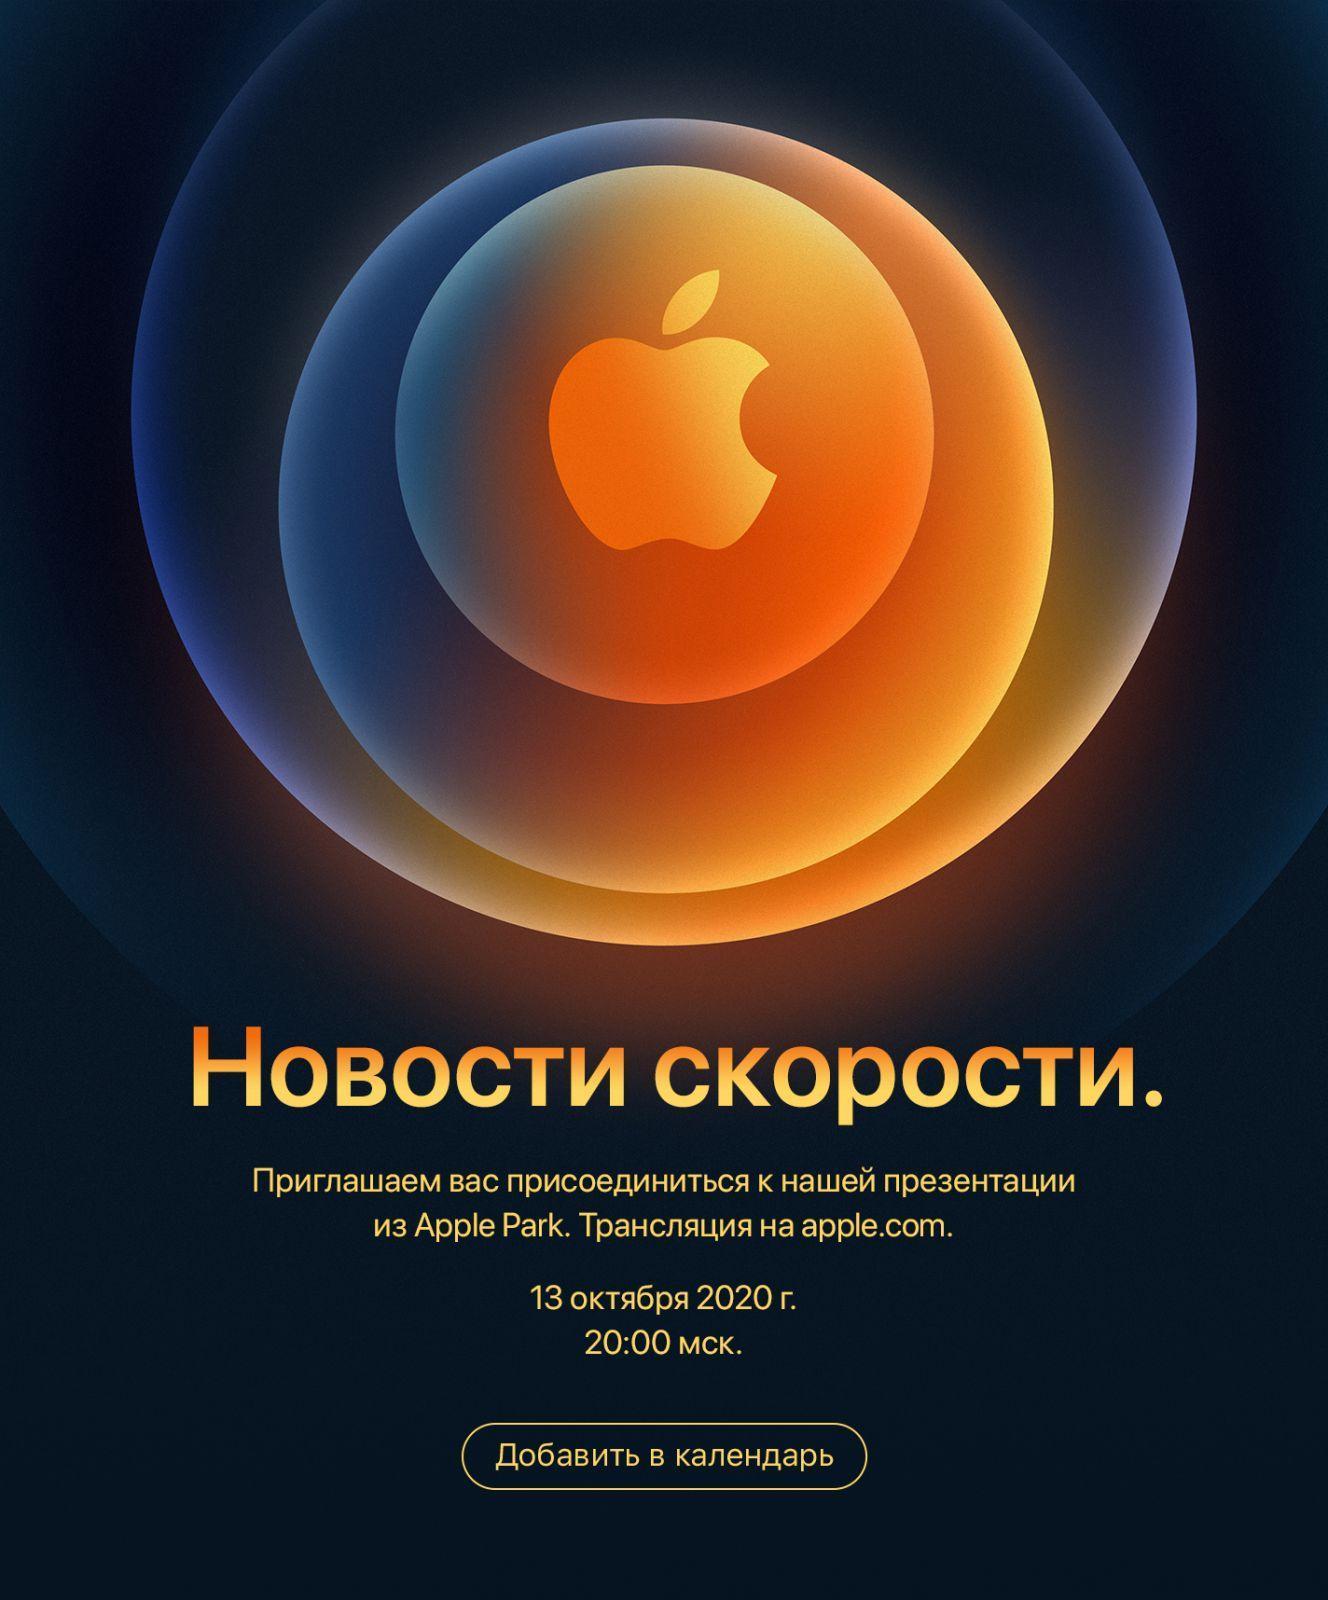 Официально: iPhone 12 представят 13 октября (mailservice)